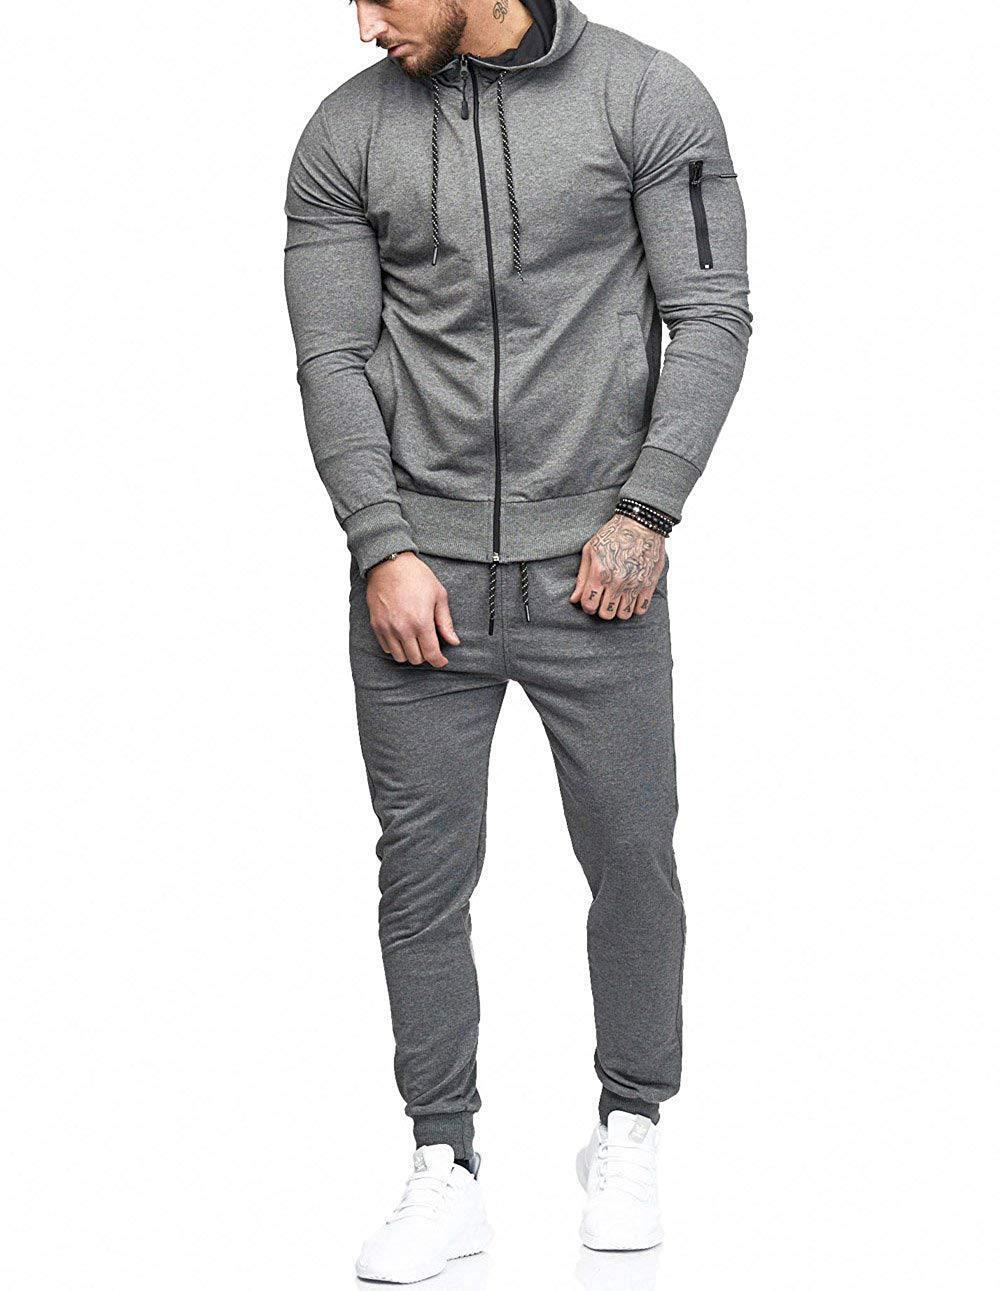 'Men's Sportswear Arm Zipper Decoration For Fitness And Leisure Men Track Suit  Sweatsuits